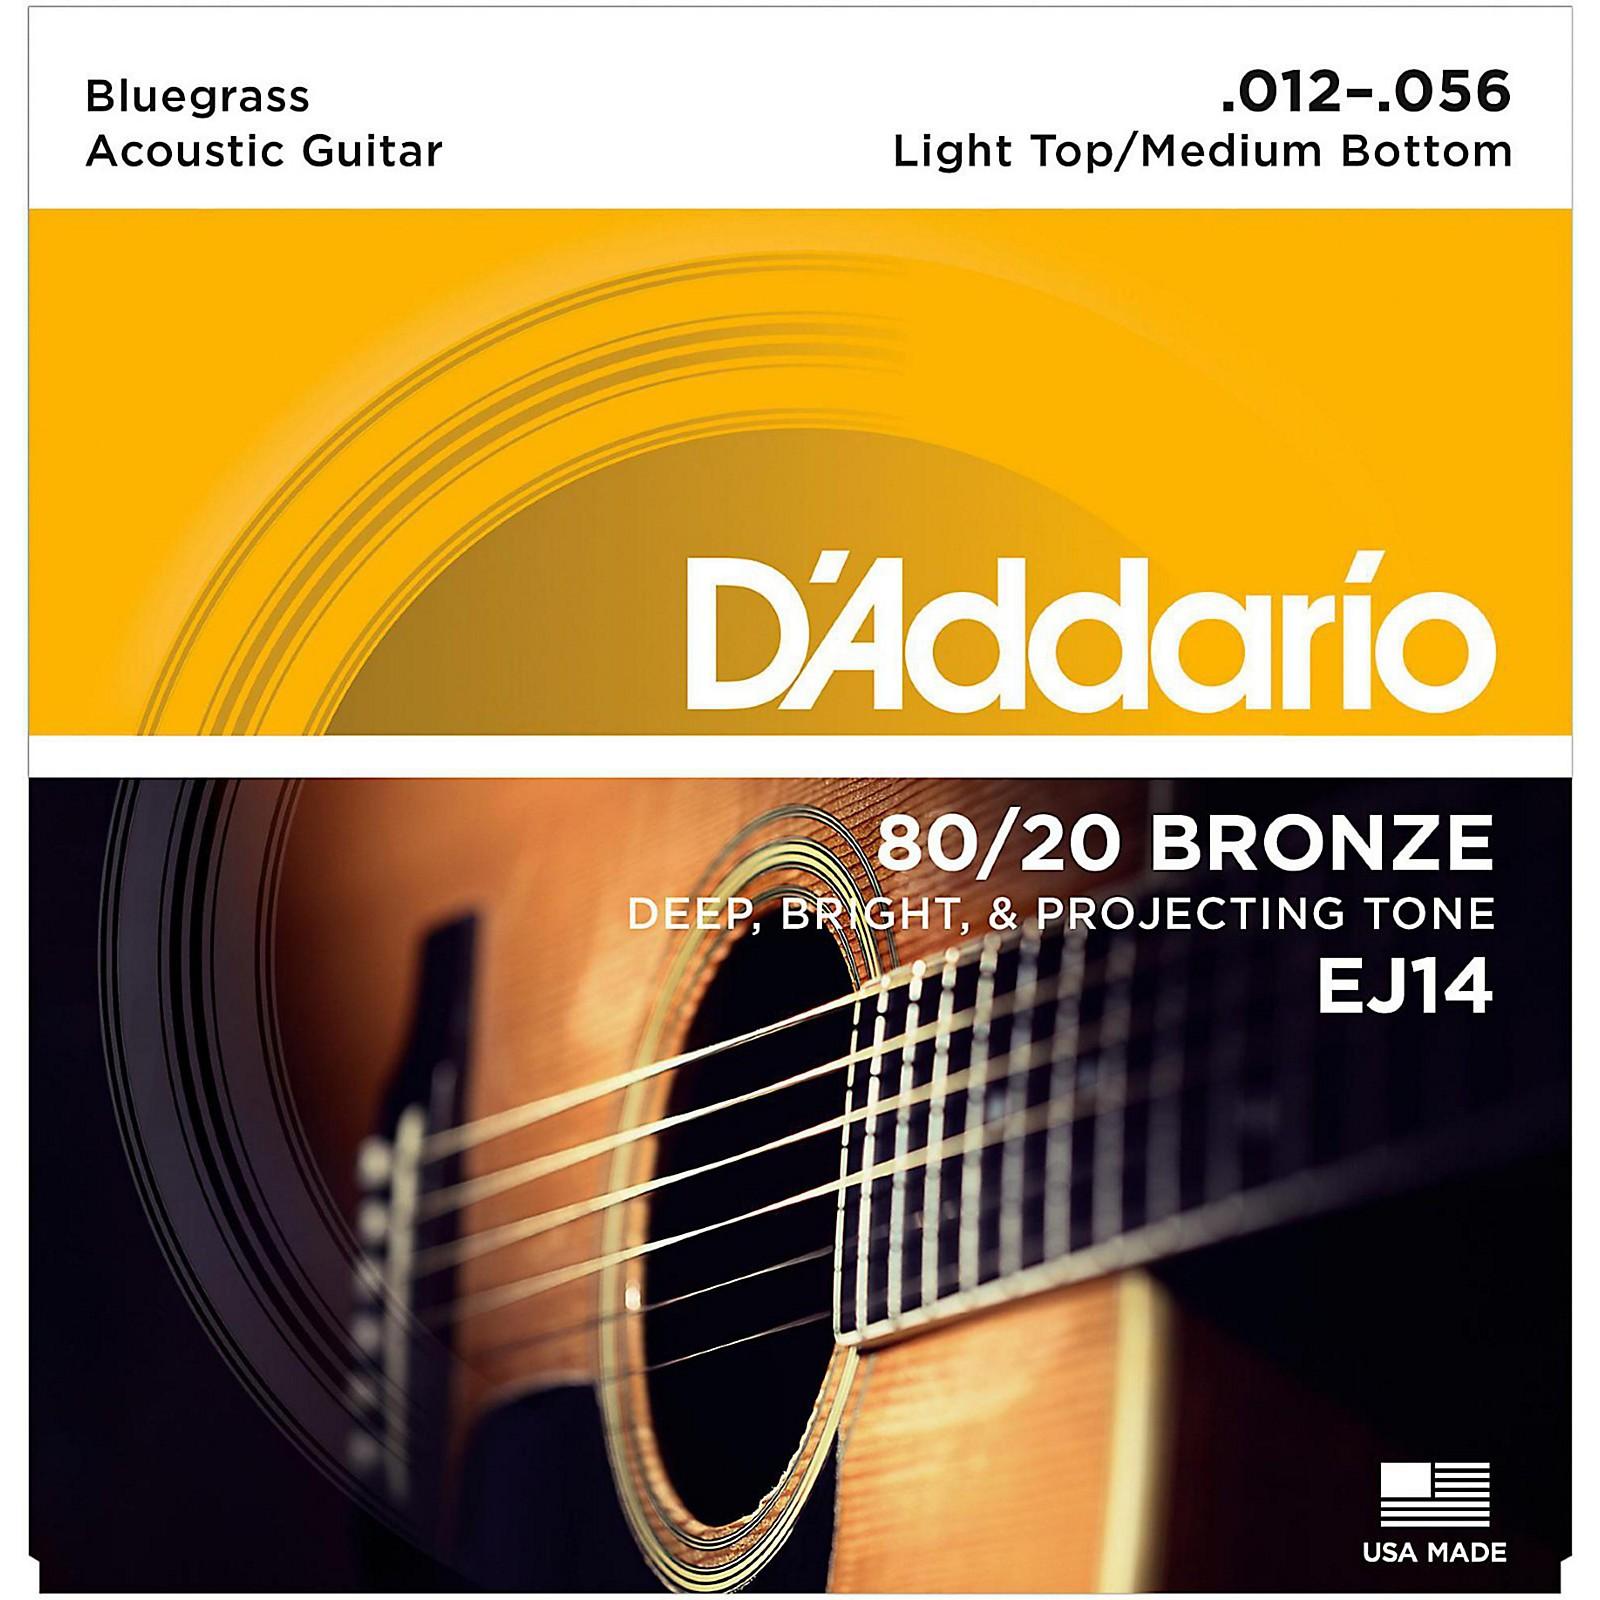 D'Addario EJ14 80/20 Bronze Bluegrass Medium Light Acoustic Guitar Strings